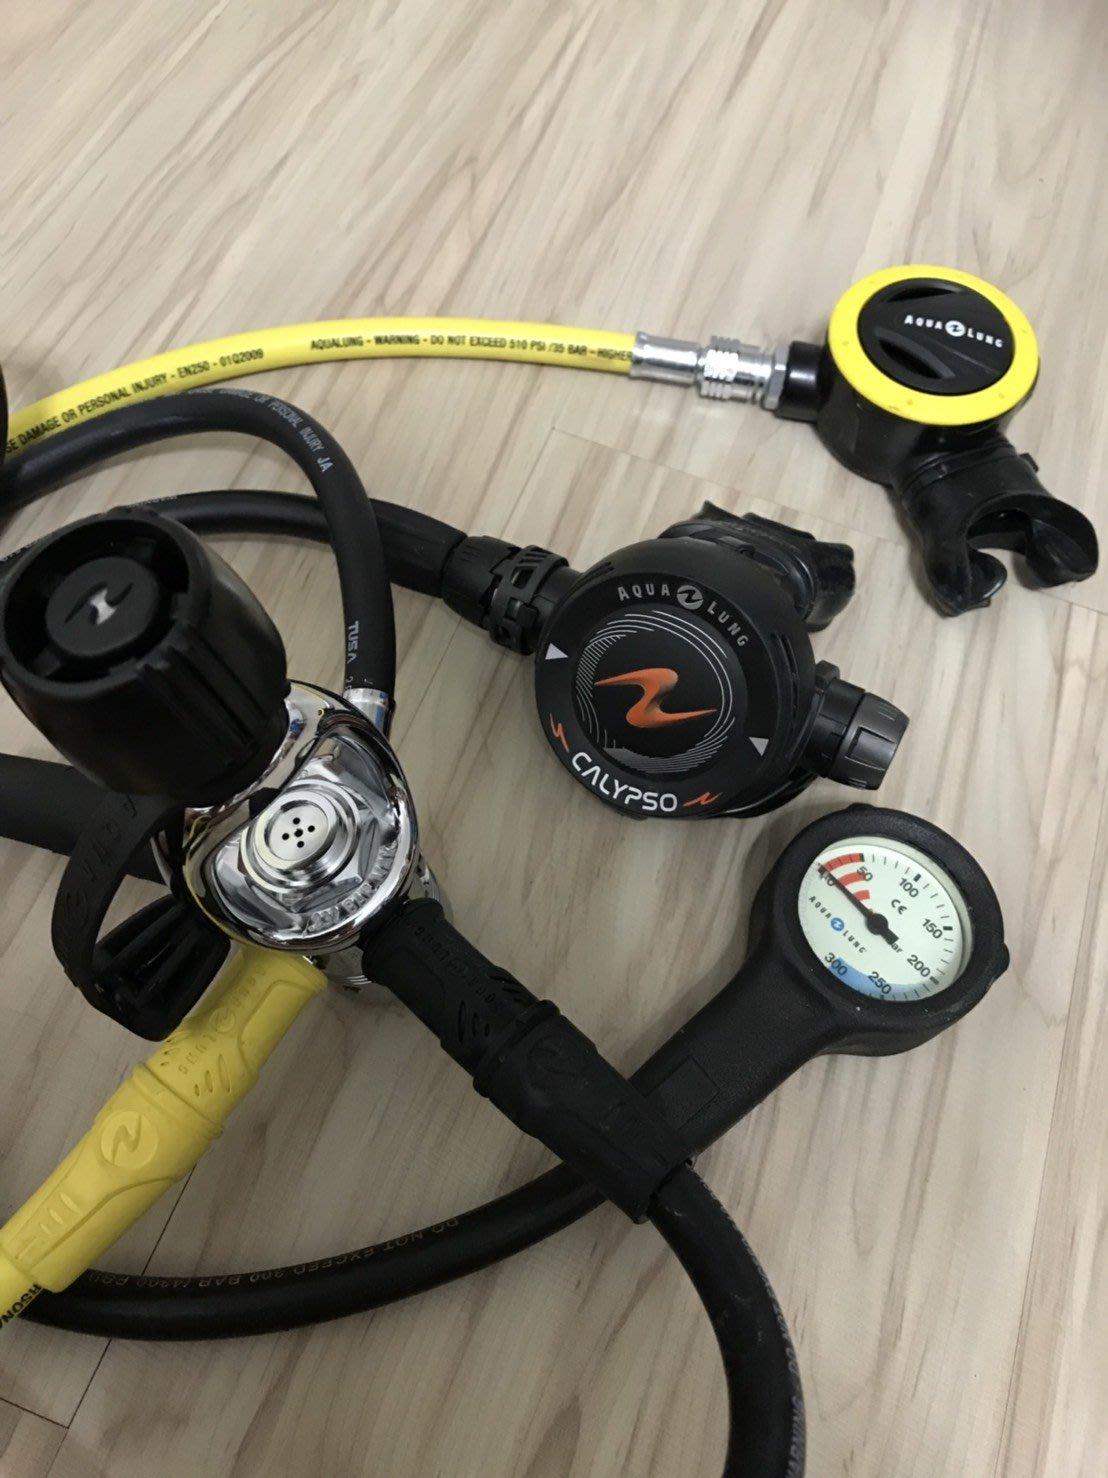 AQUALUNG CALYPSO 水精靈 調節器組 AQUA LUNG 殘壓單錶 近全新 潛水調節器 一年保固